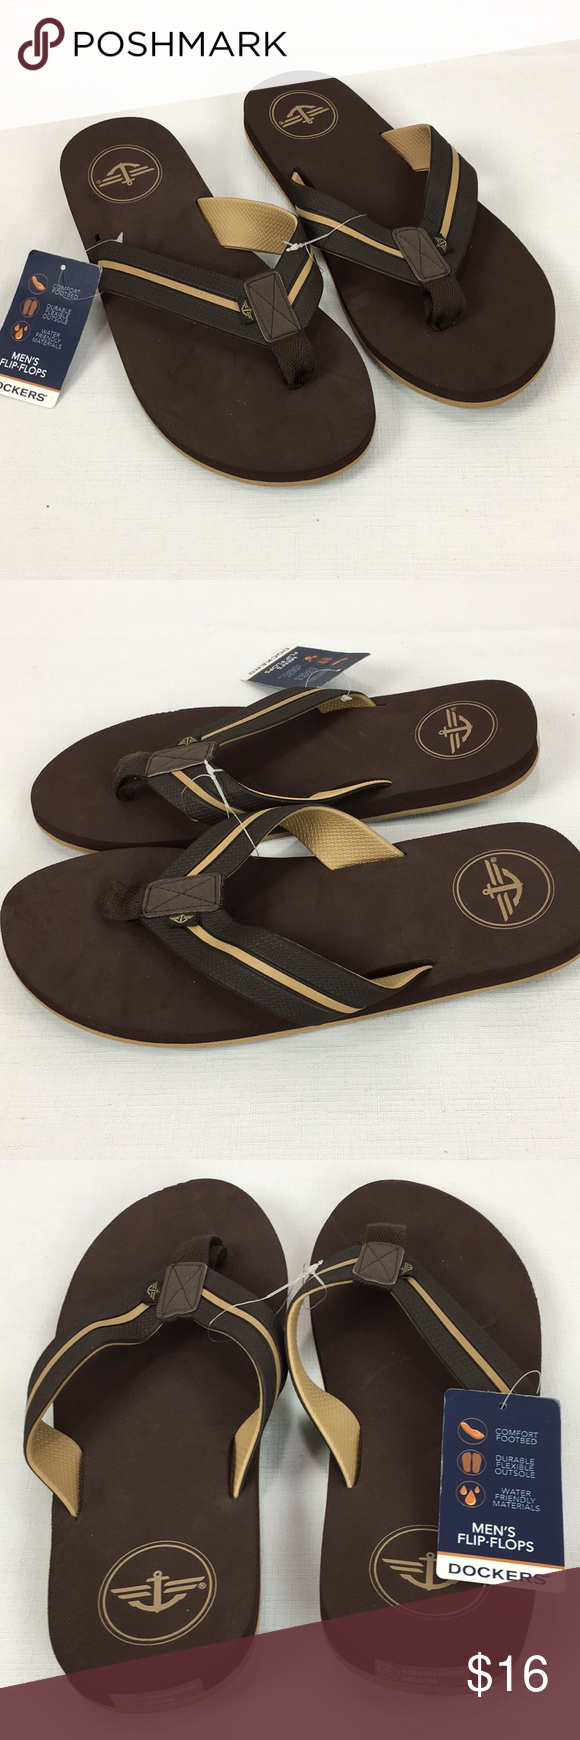 f25bf3aab0cf NWT Dockers Men s Thong Flip Flops Brown Comfort Brand new pair of men s  Dockers flip flops